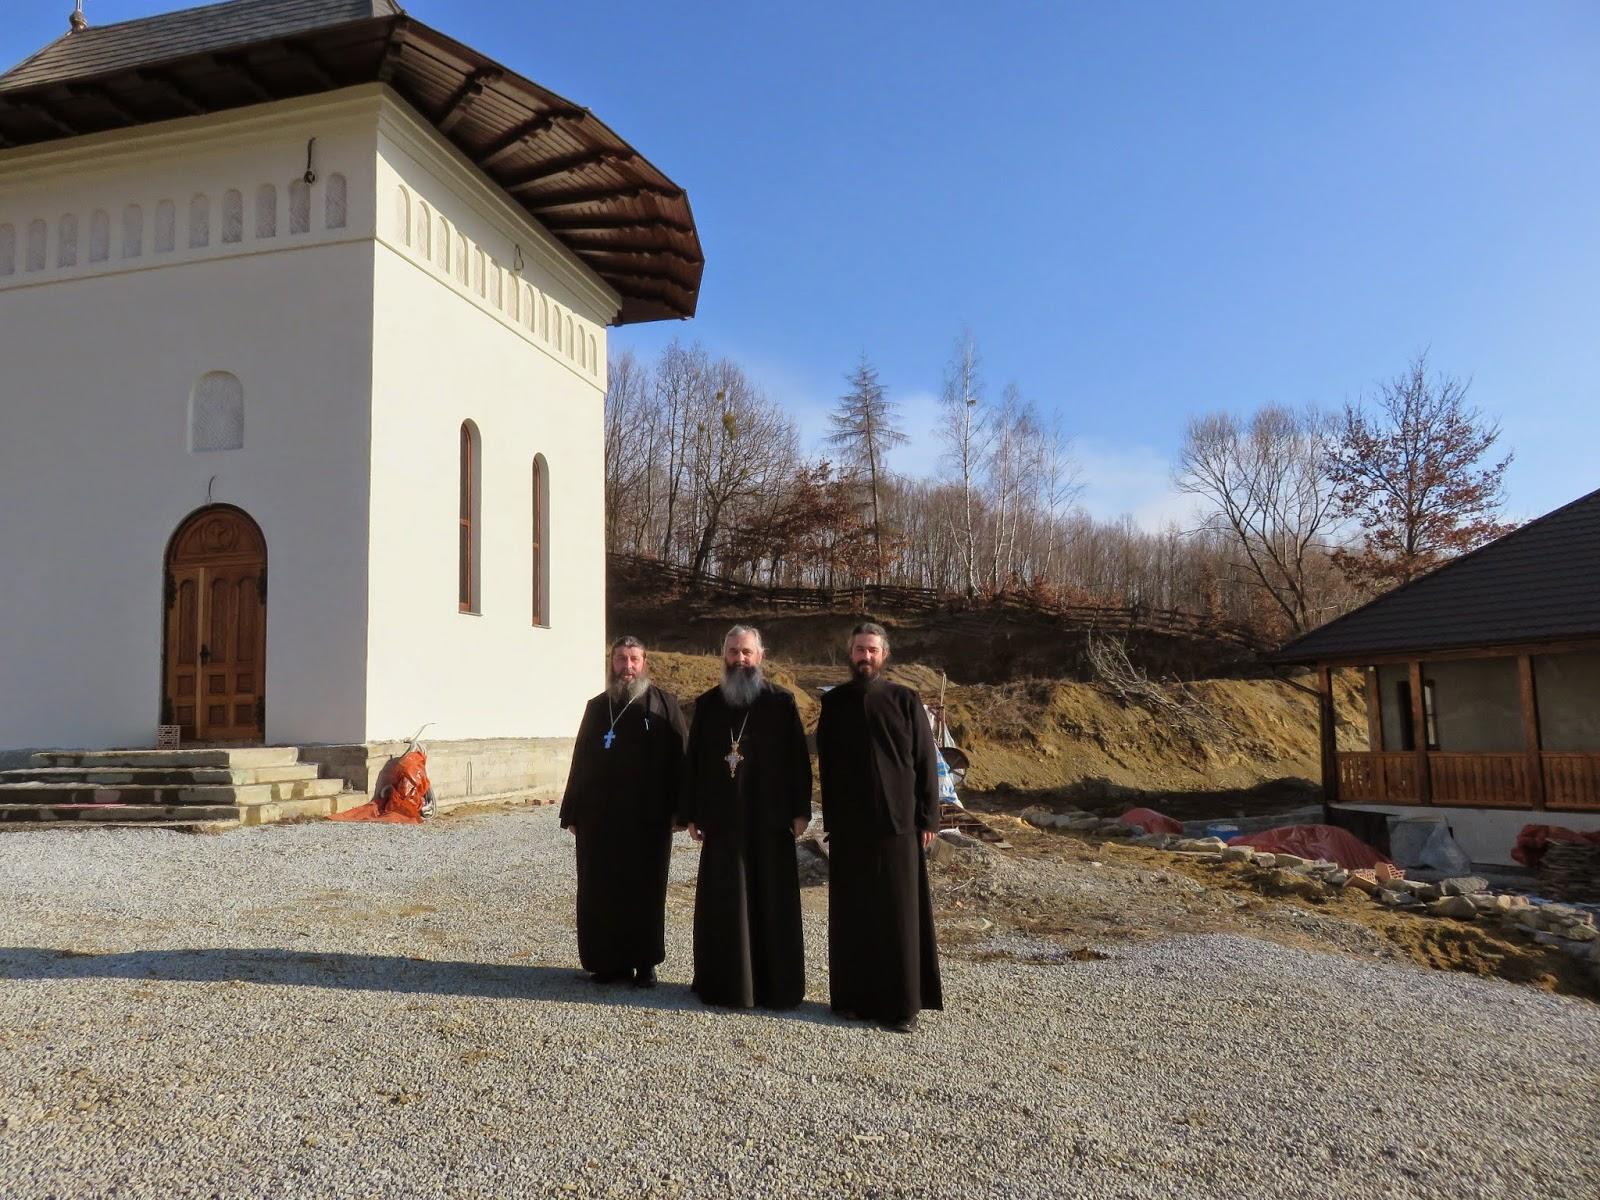 Botezul pruncii Antonia-Teodora Rosca, Manastirea Stramba